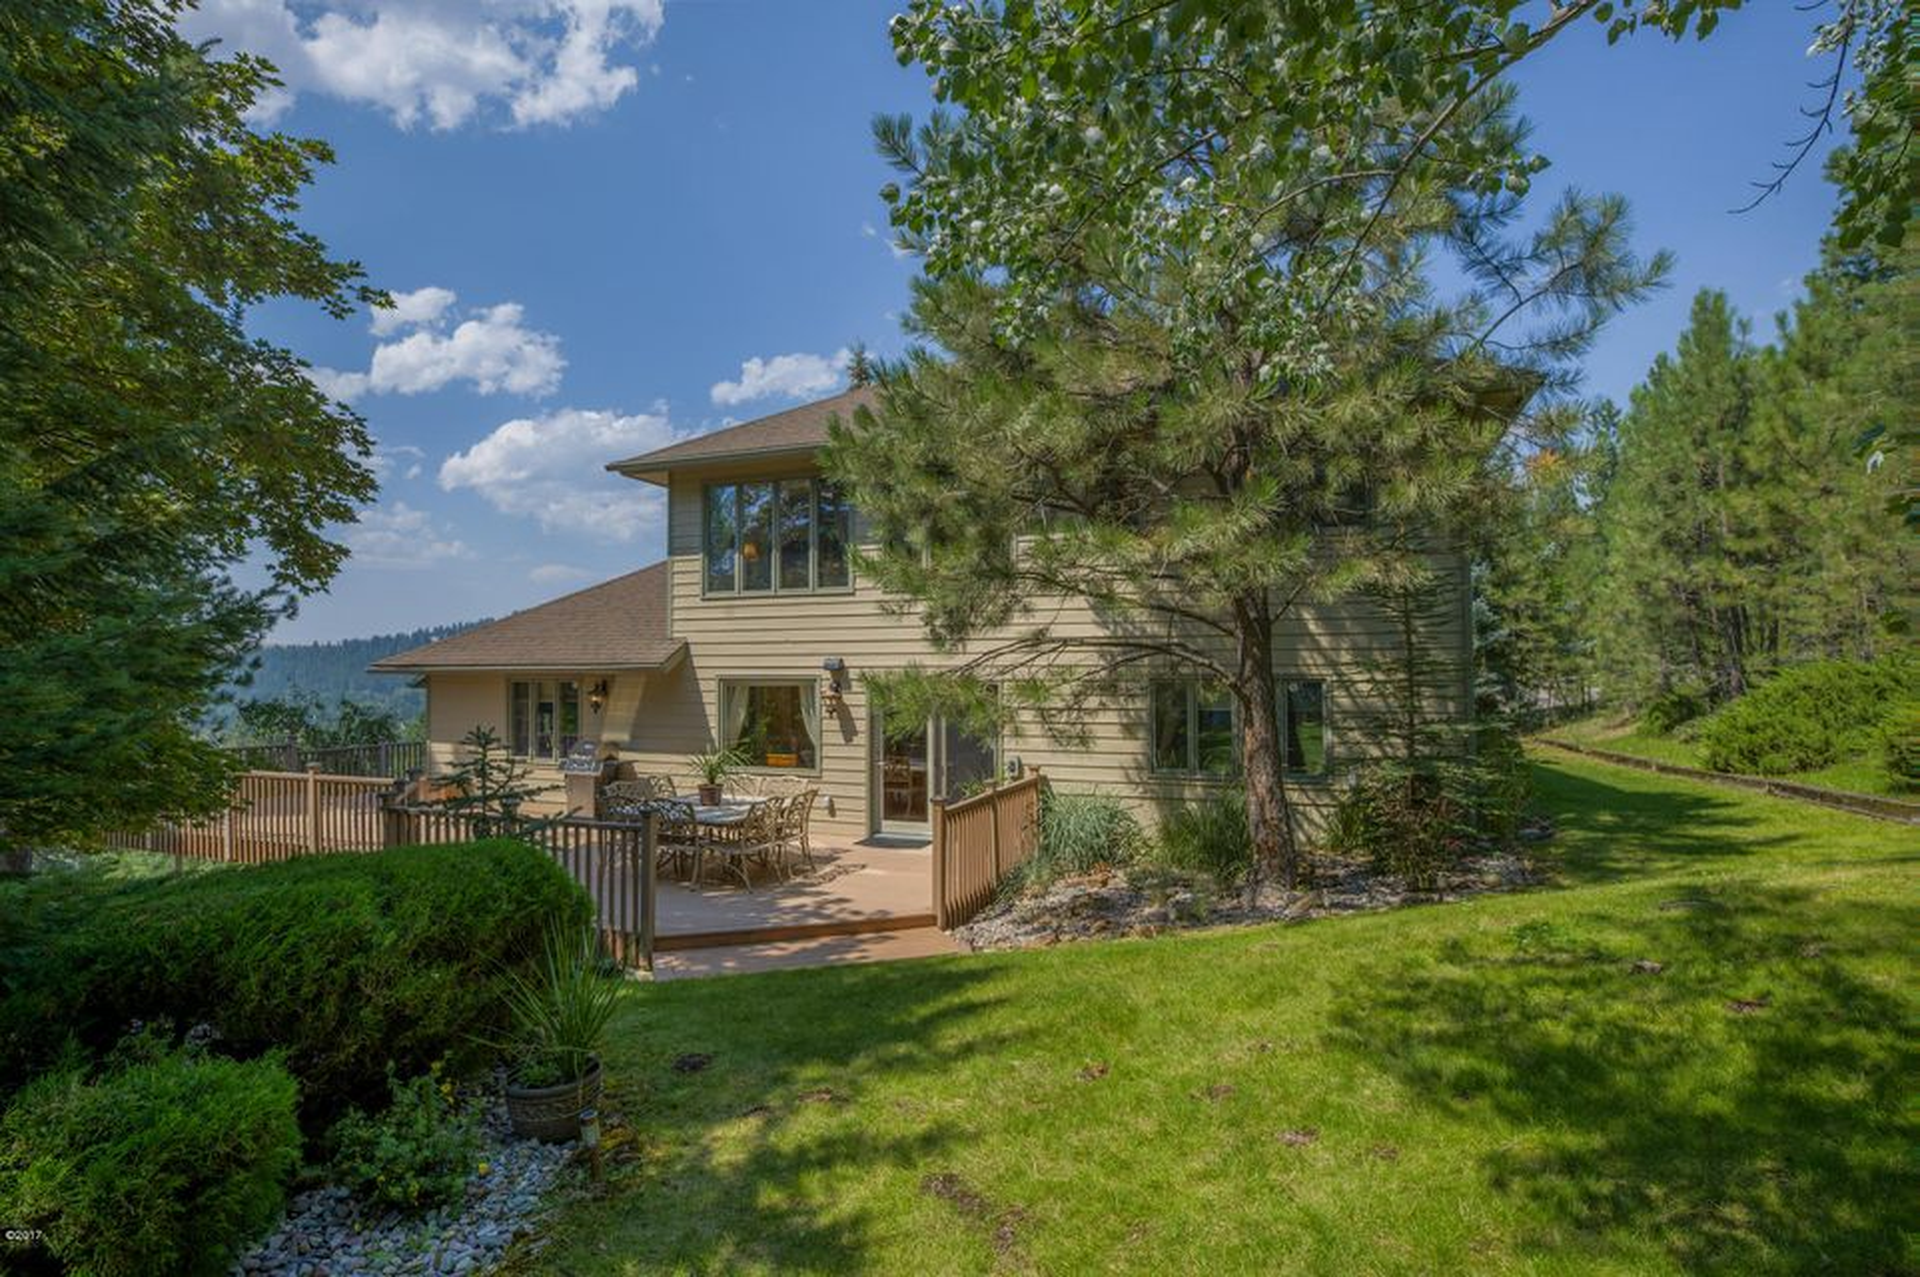 Single Family Home for Sale at 1275 Starwood Drive Missoula, Montana 59808 United States